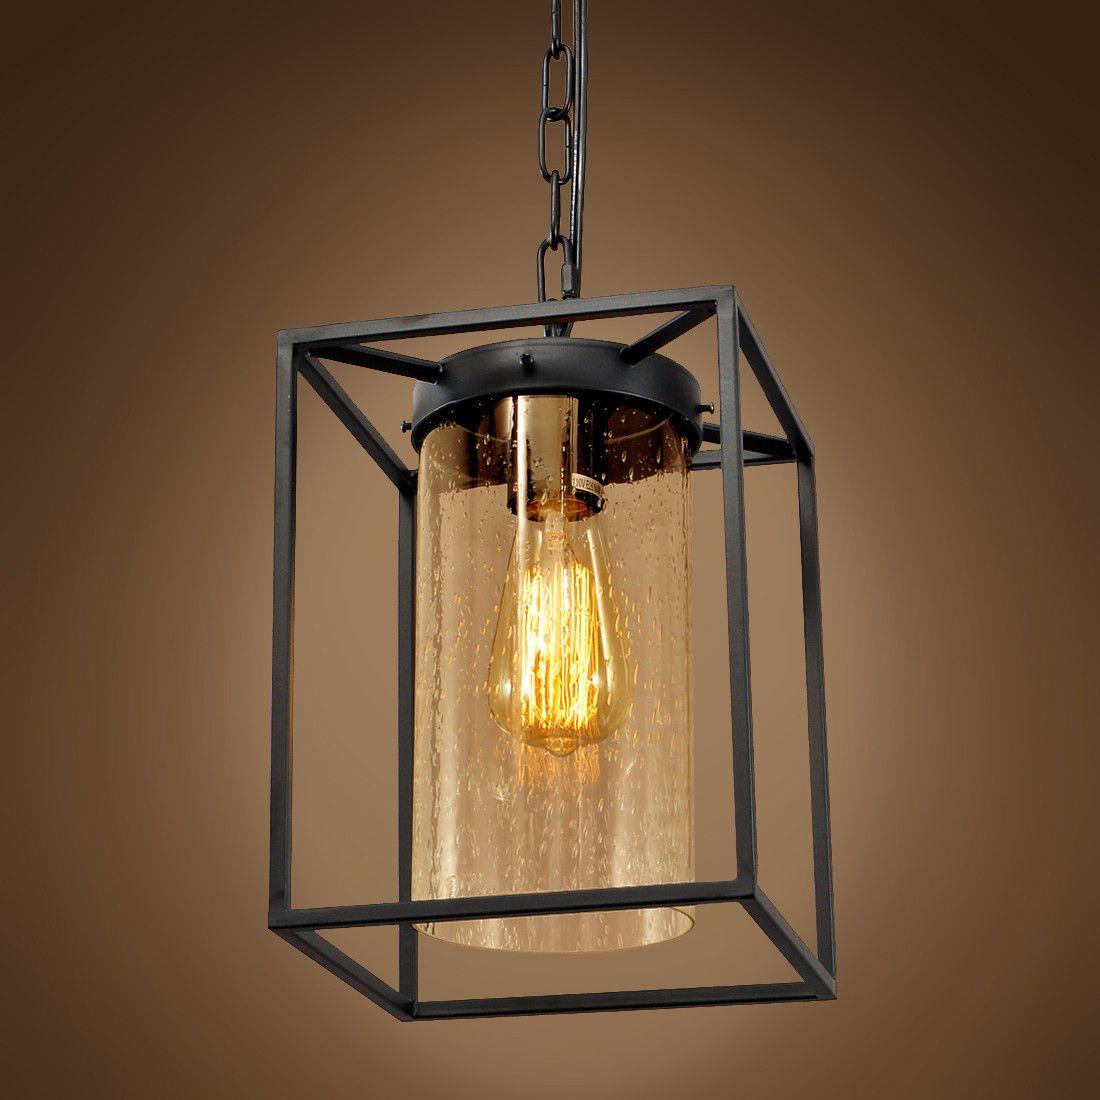 Buy A Handmade Cute Iron Glass Pendant Light Industrial